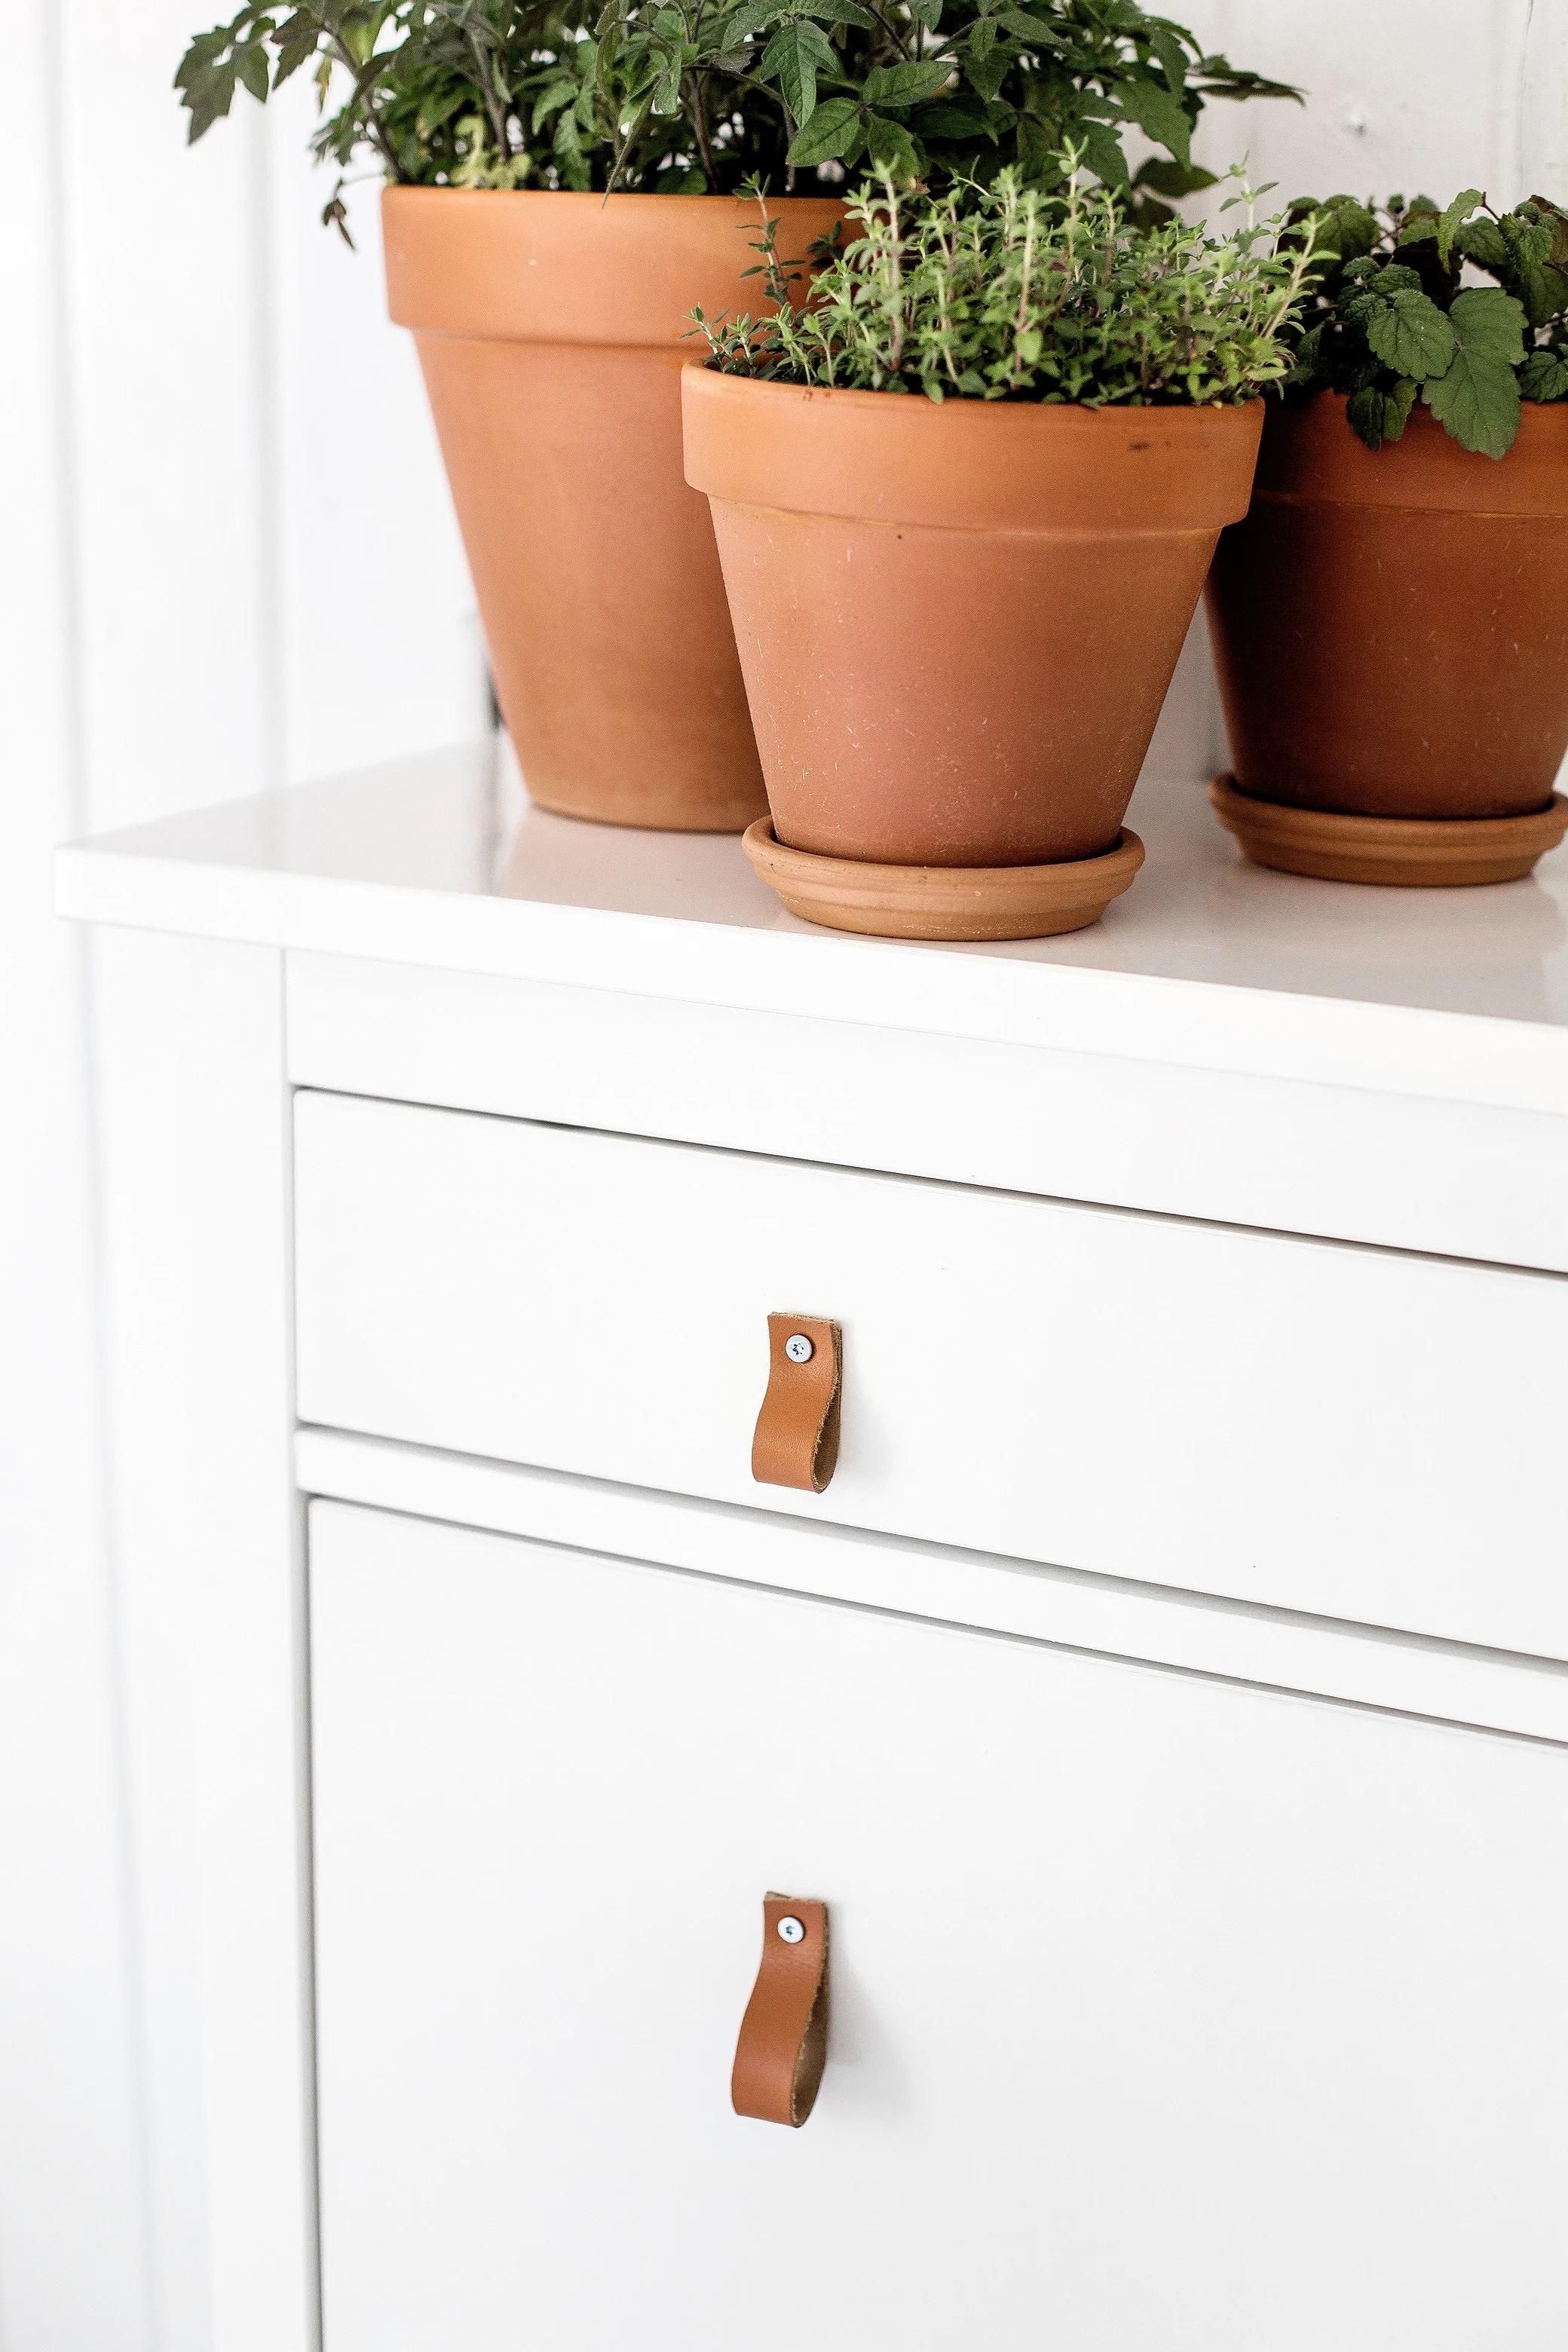 DIY - THE LEATHER KNOB